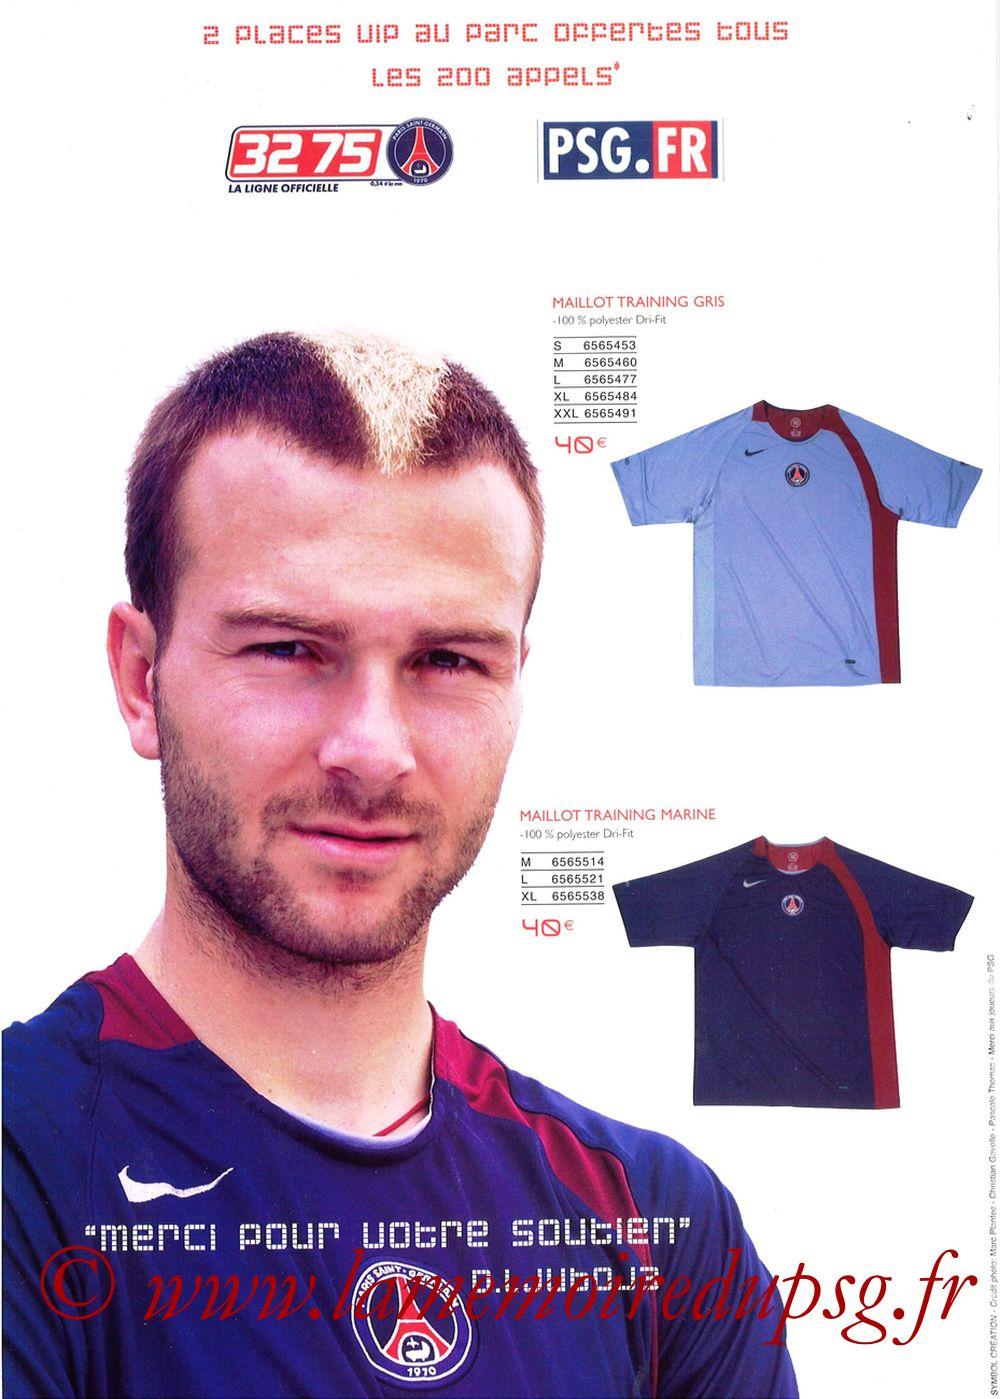 Catalogue PSG - 2004-05b - Page 08